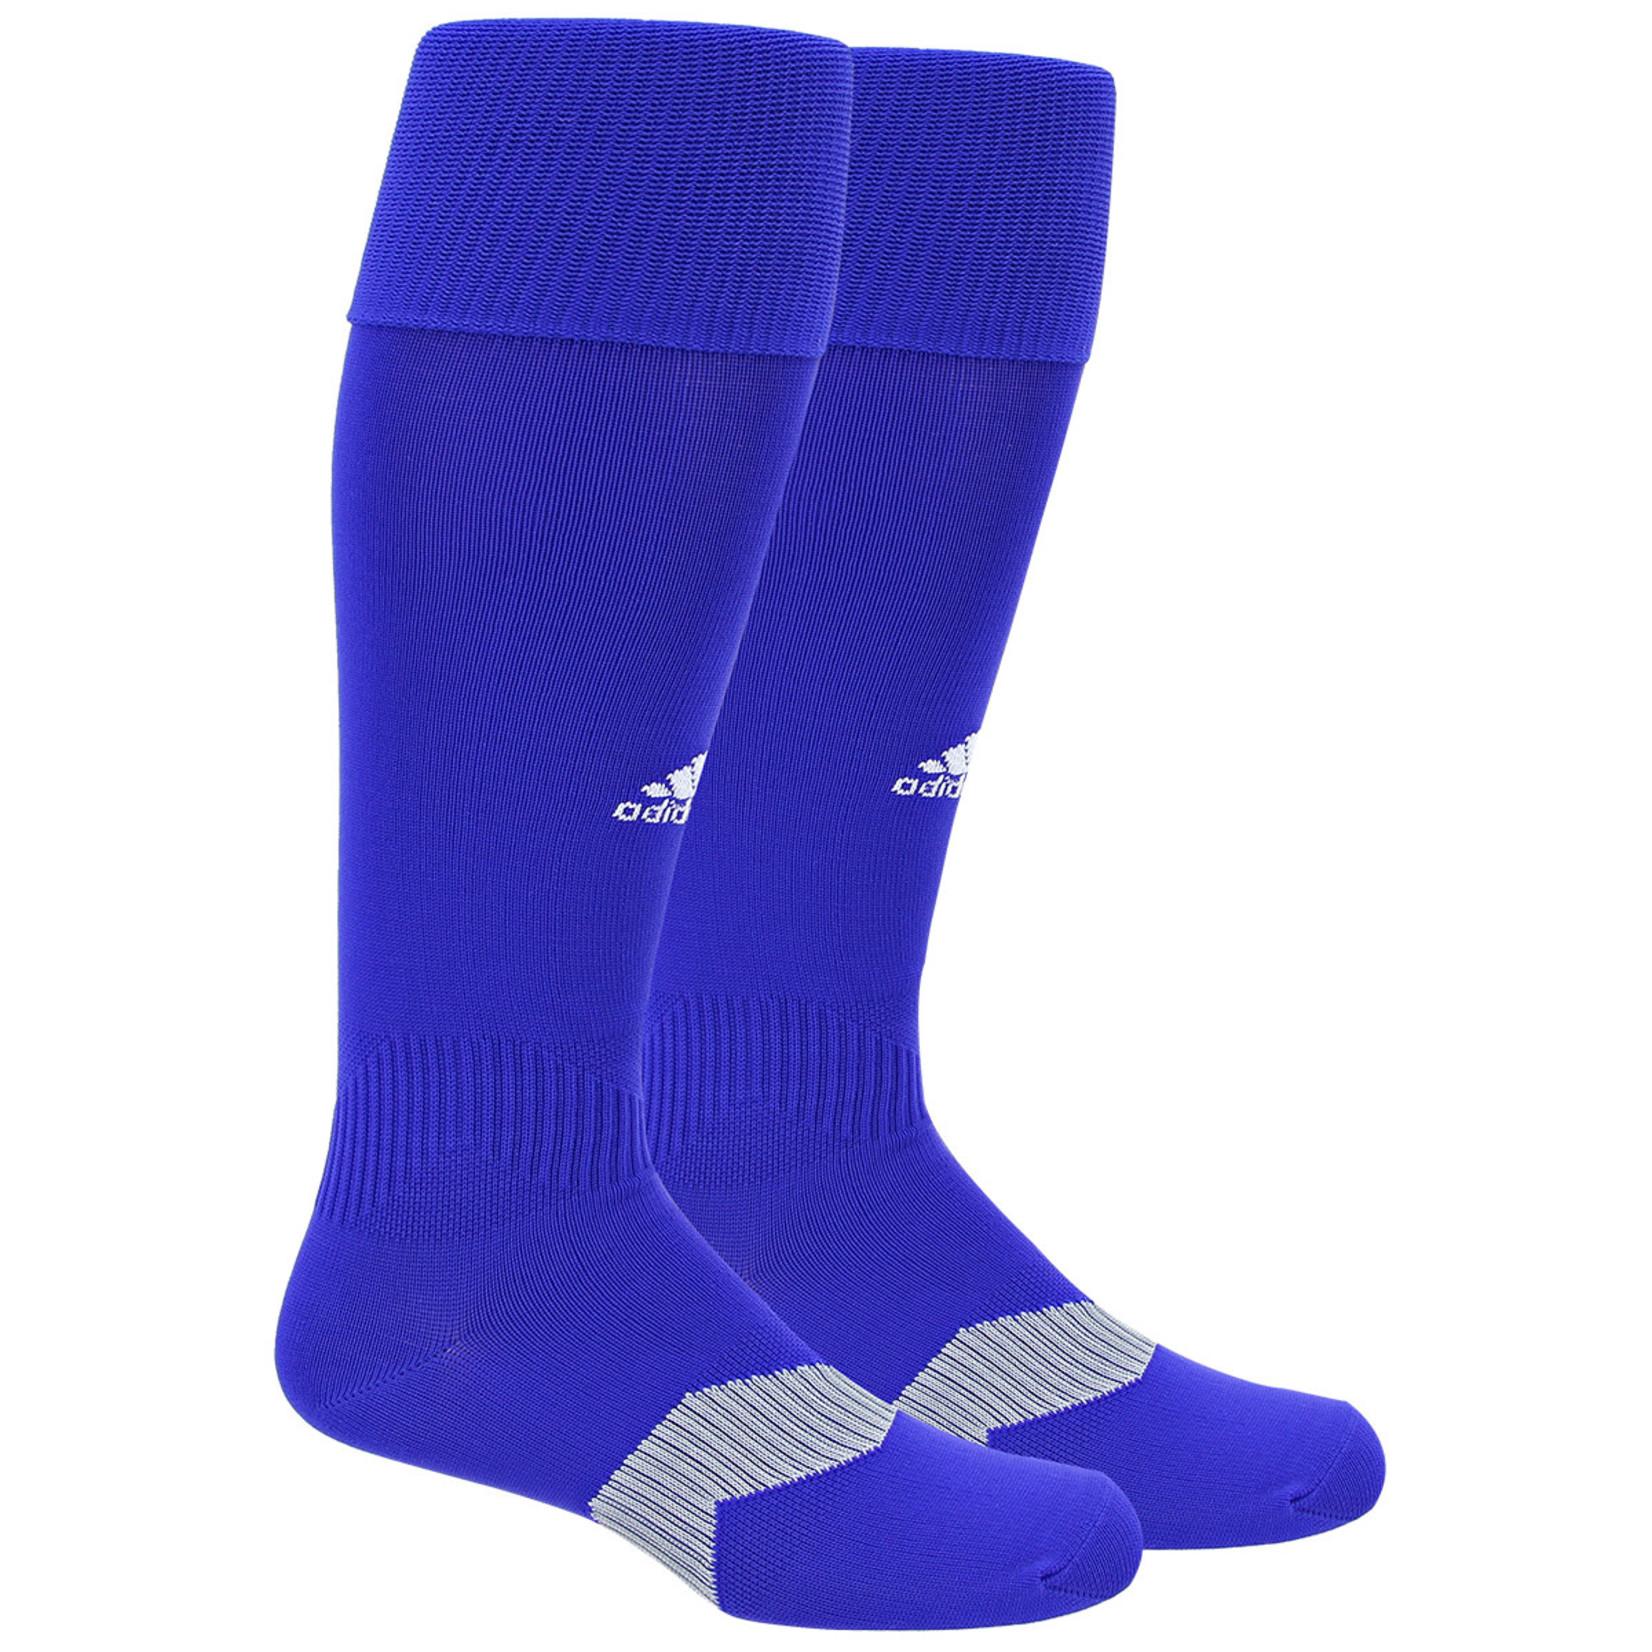 ADIDAS METRO IV SOCKS (BLUE)